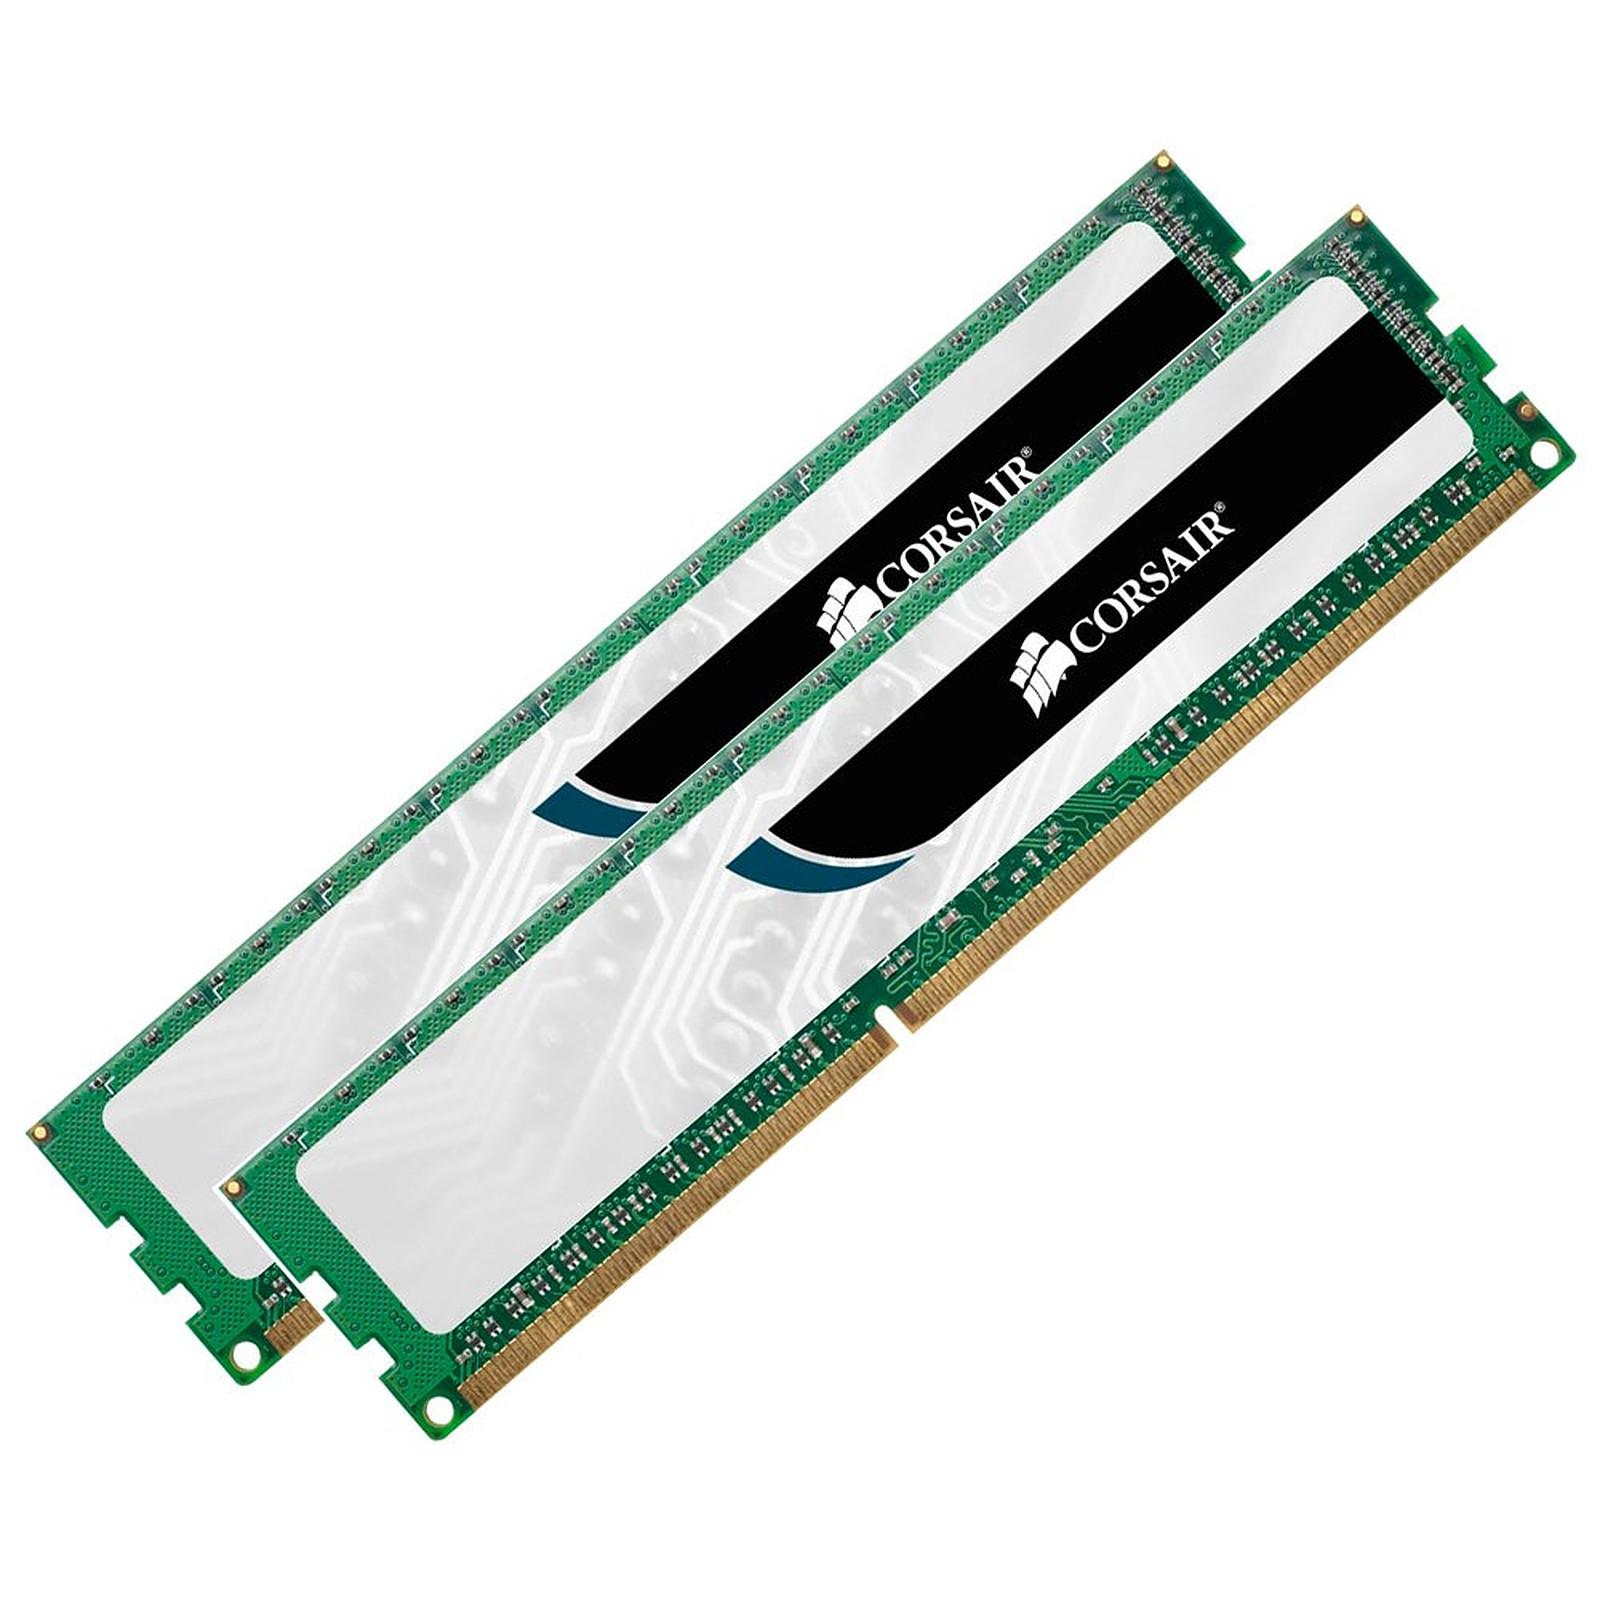 Corsair Value Select 8 Go (2x 4Go) DDR3 1333MHz CL9